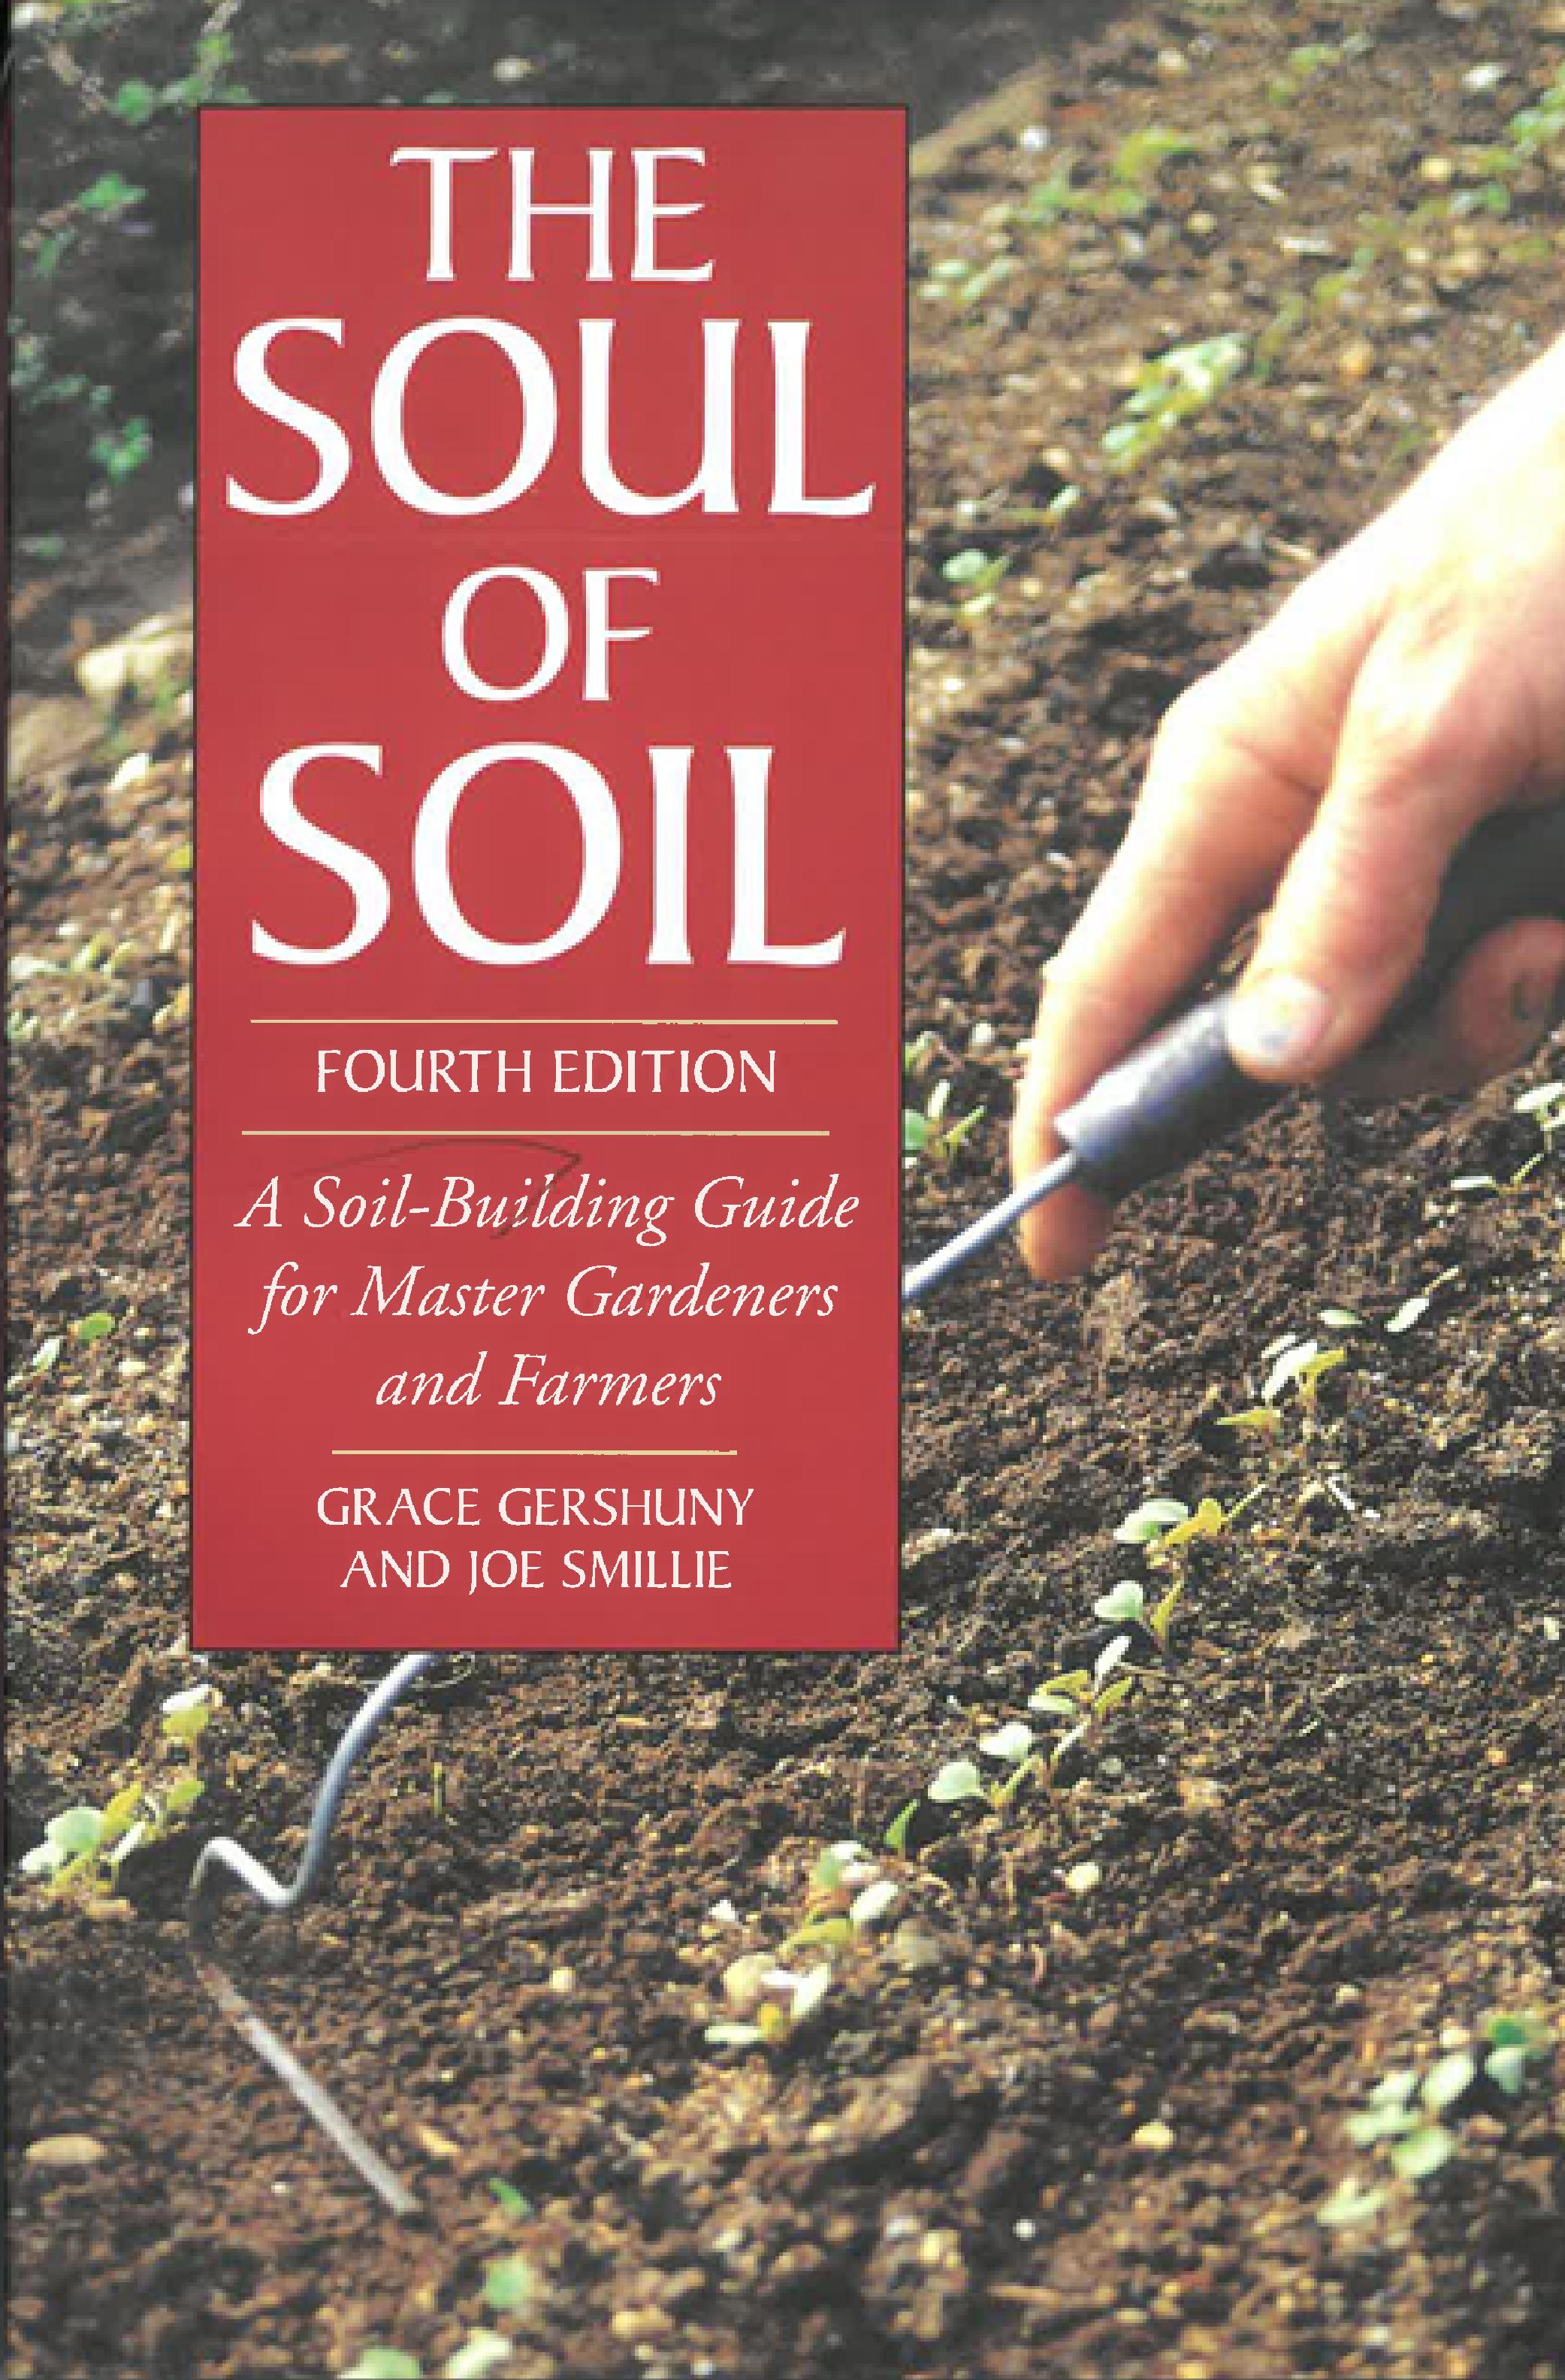 The Soul of Soil: A Soil-Building G